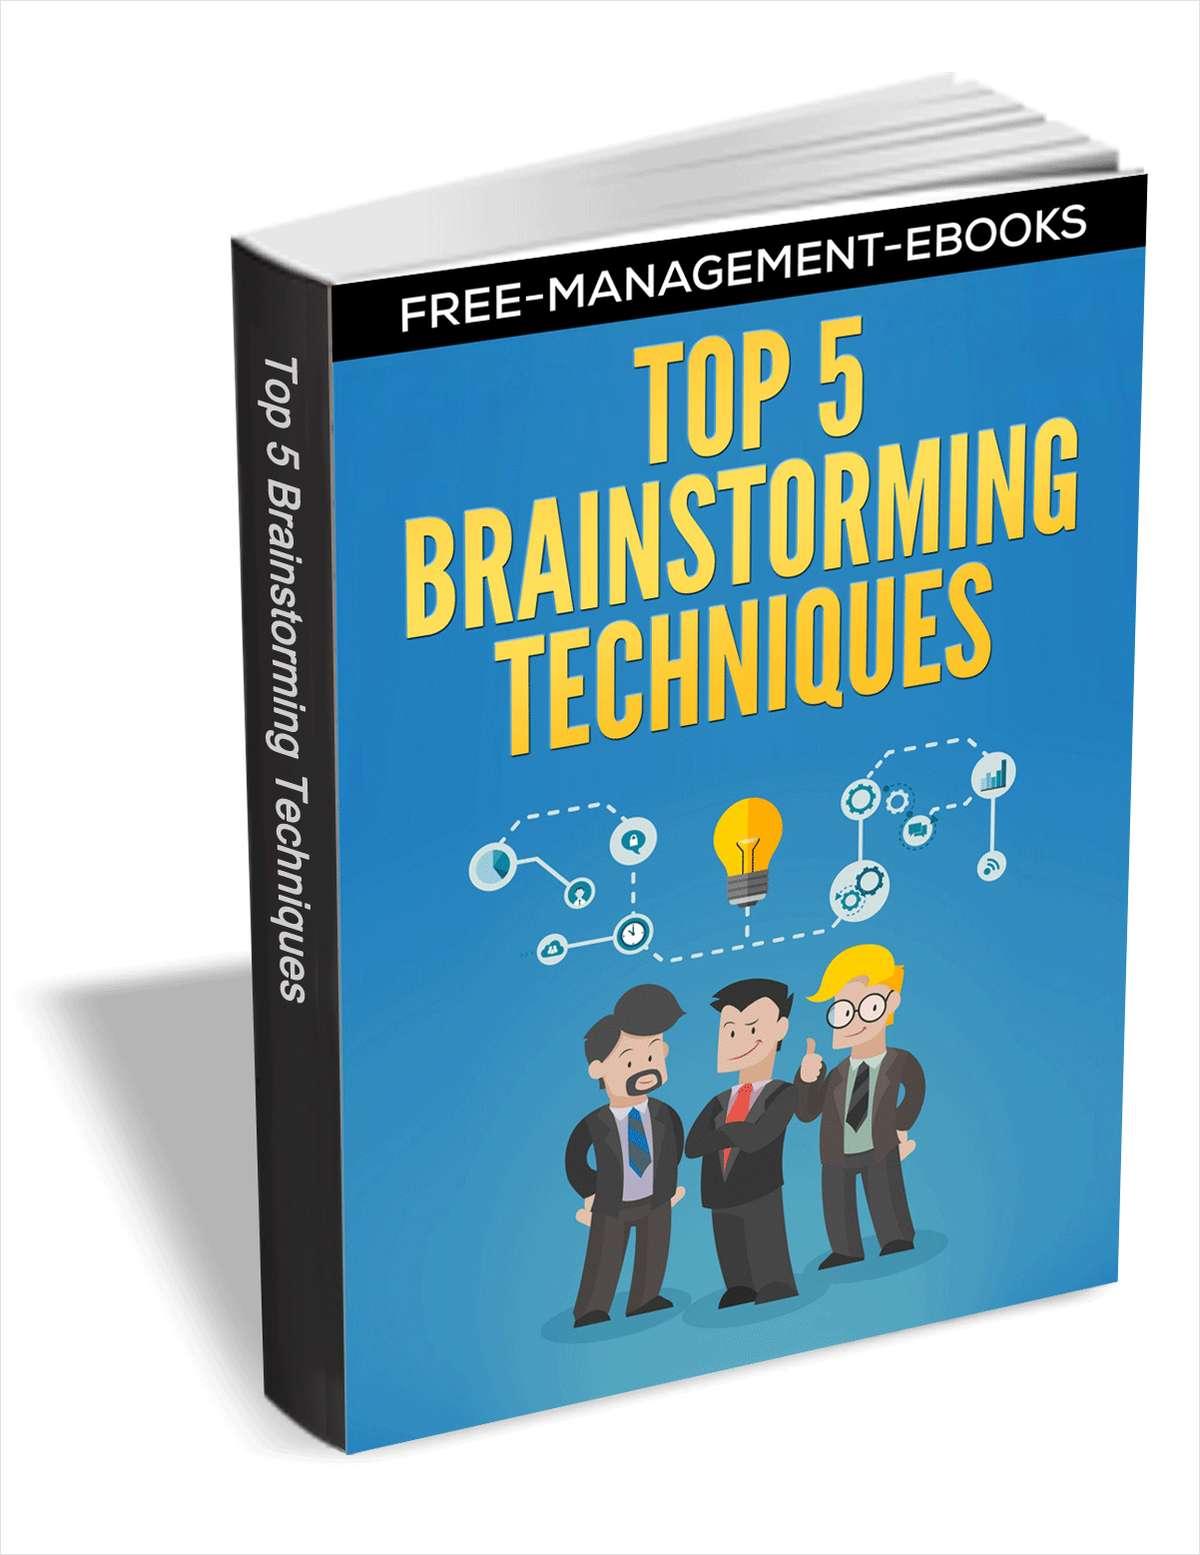 Top 5 Brainstorming Techniques